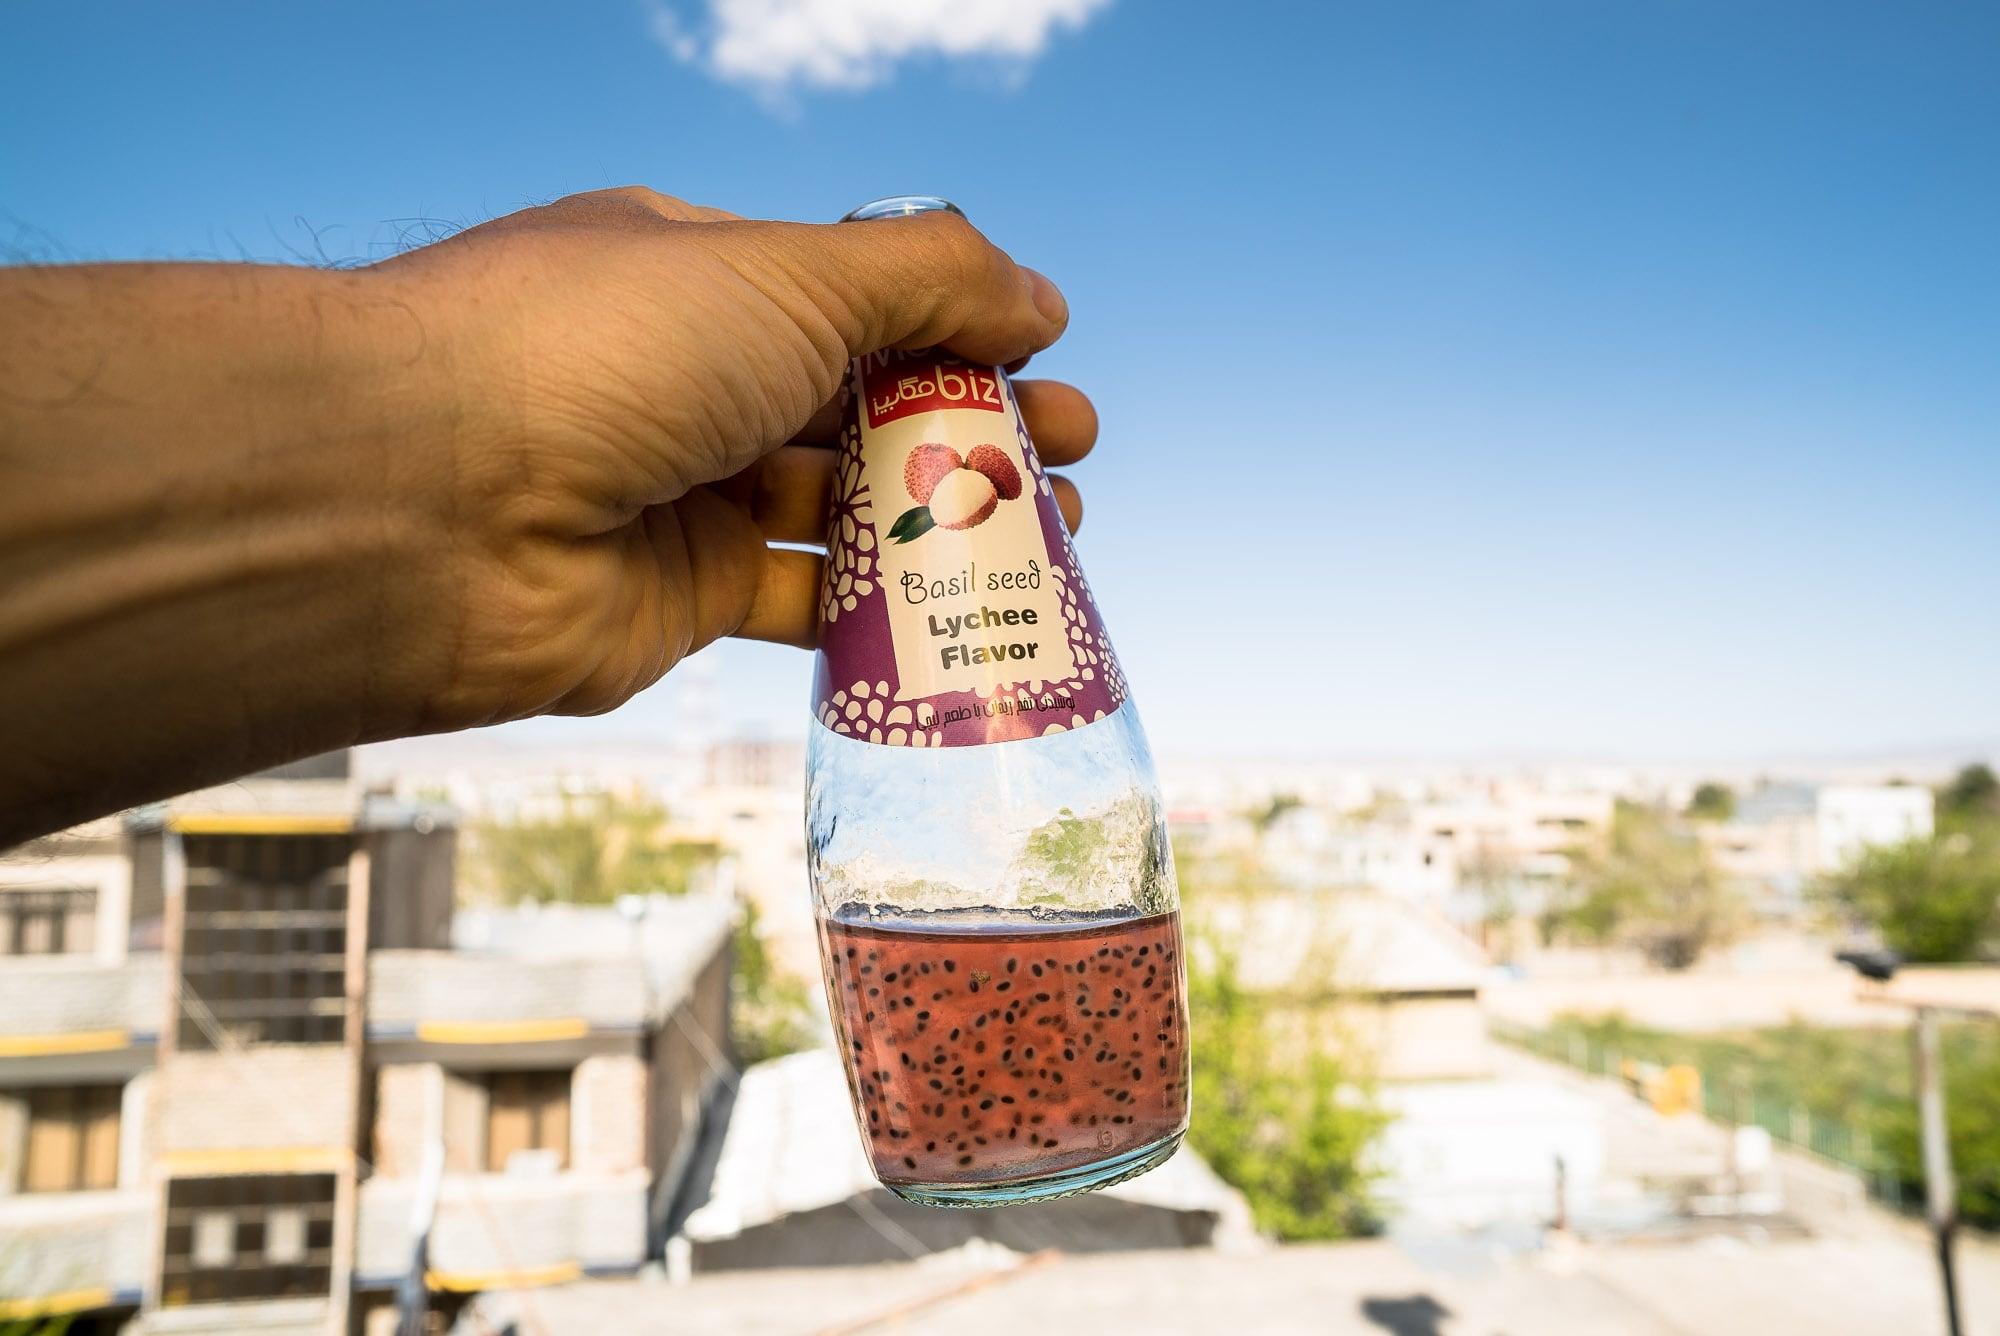 Basil Seed Lychee Flavor